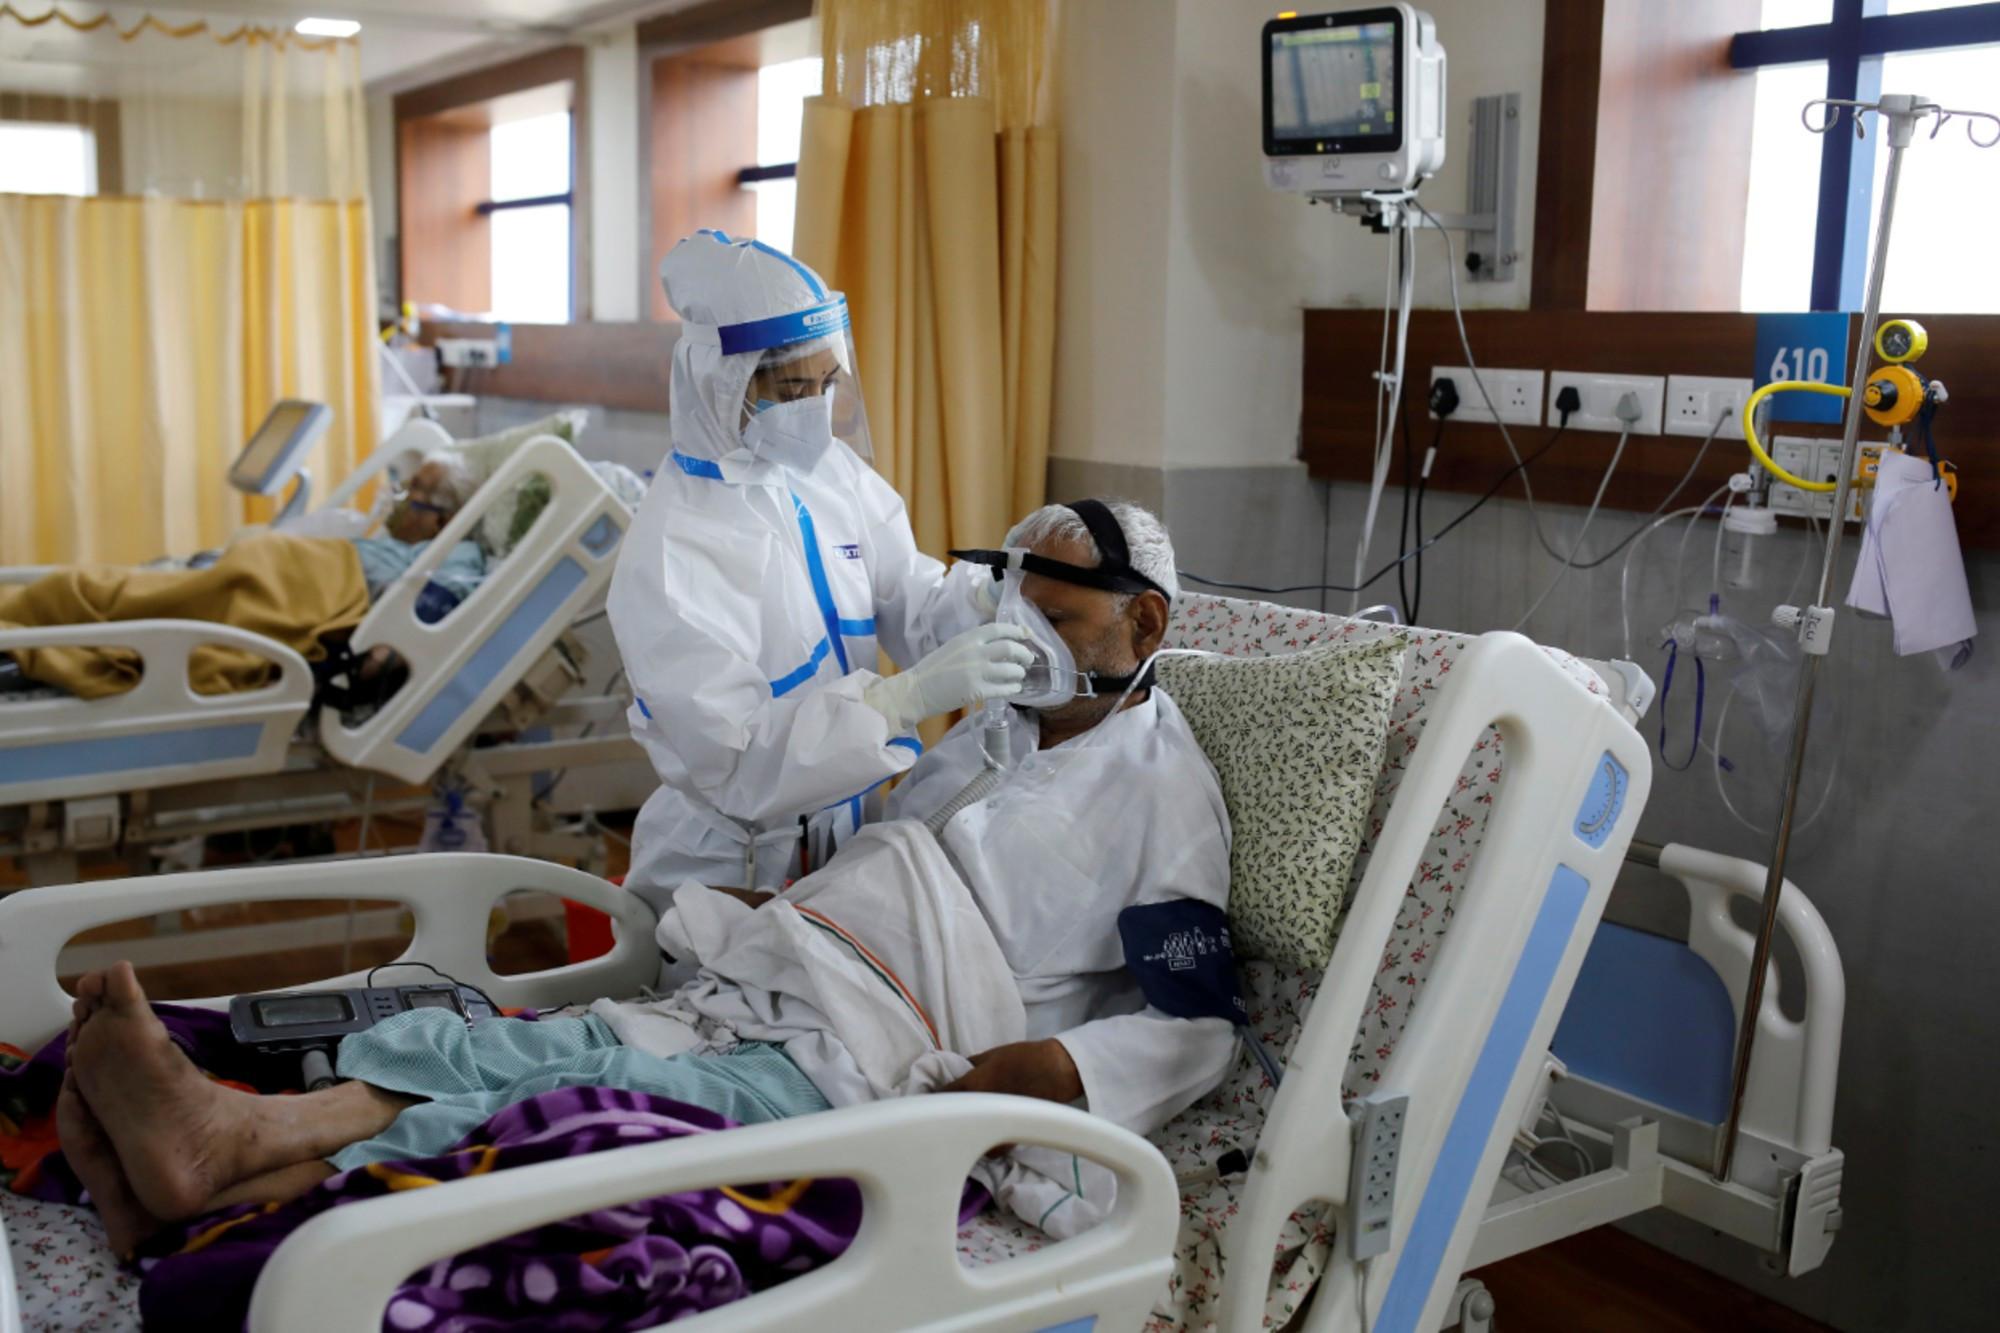 hospitals-in-india-scramble-for-oxygen-as-coronavirus-cases-top-5-million Photo